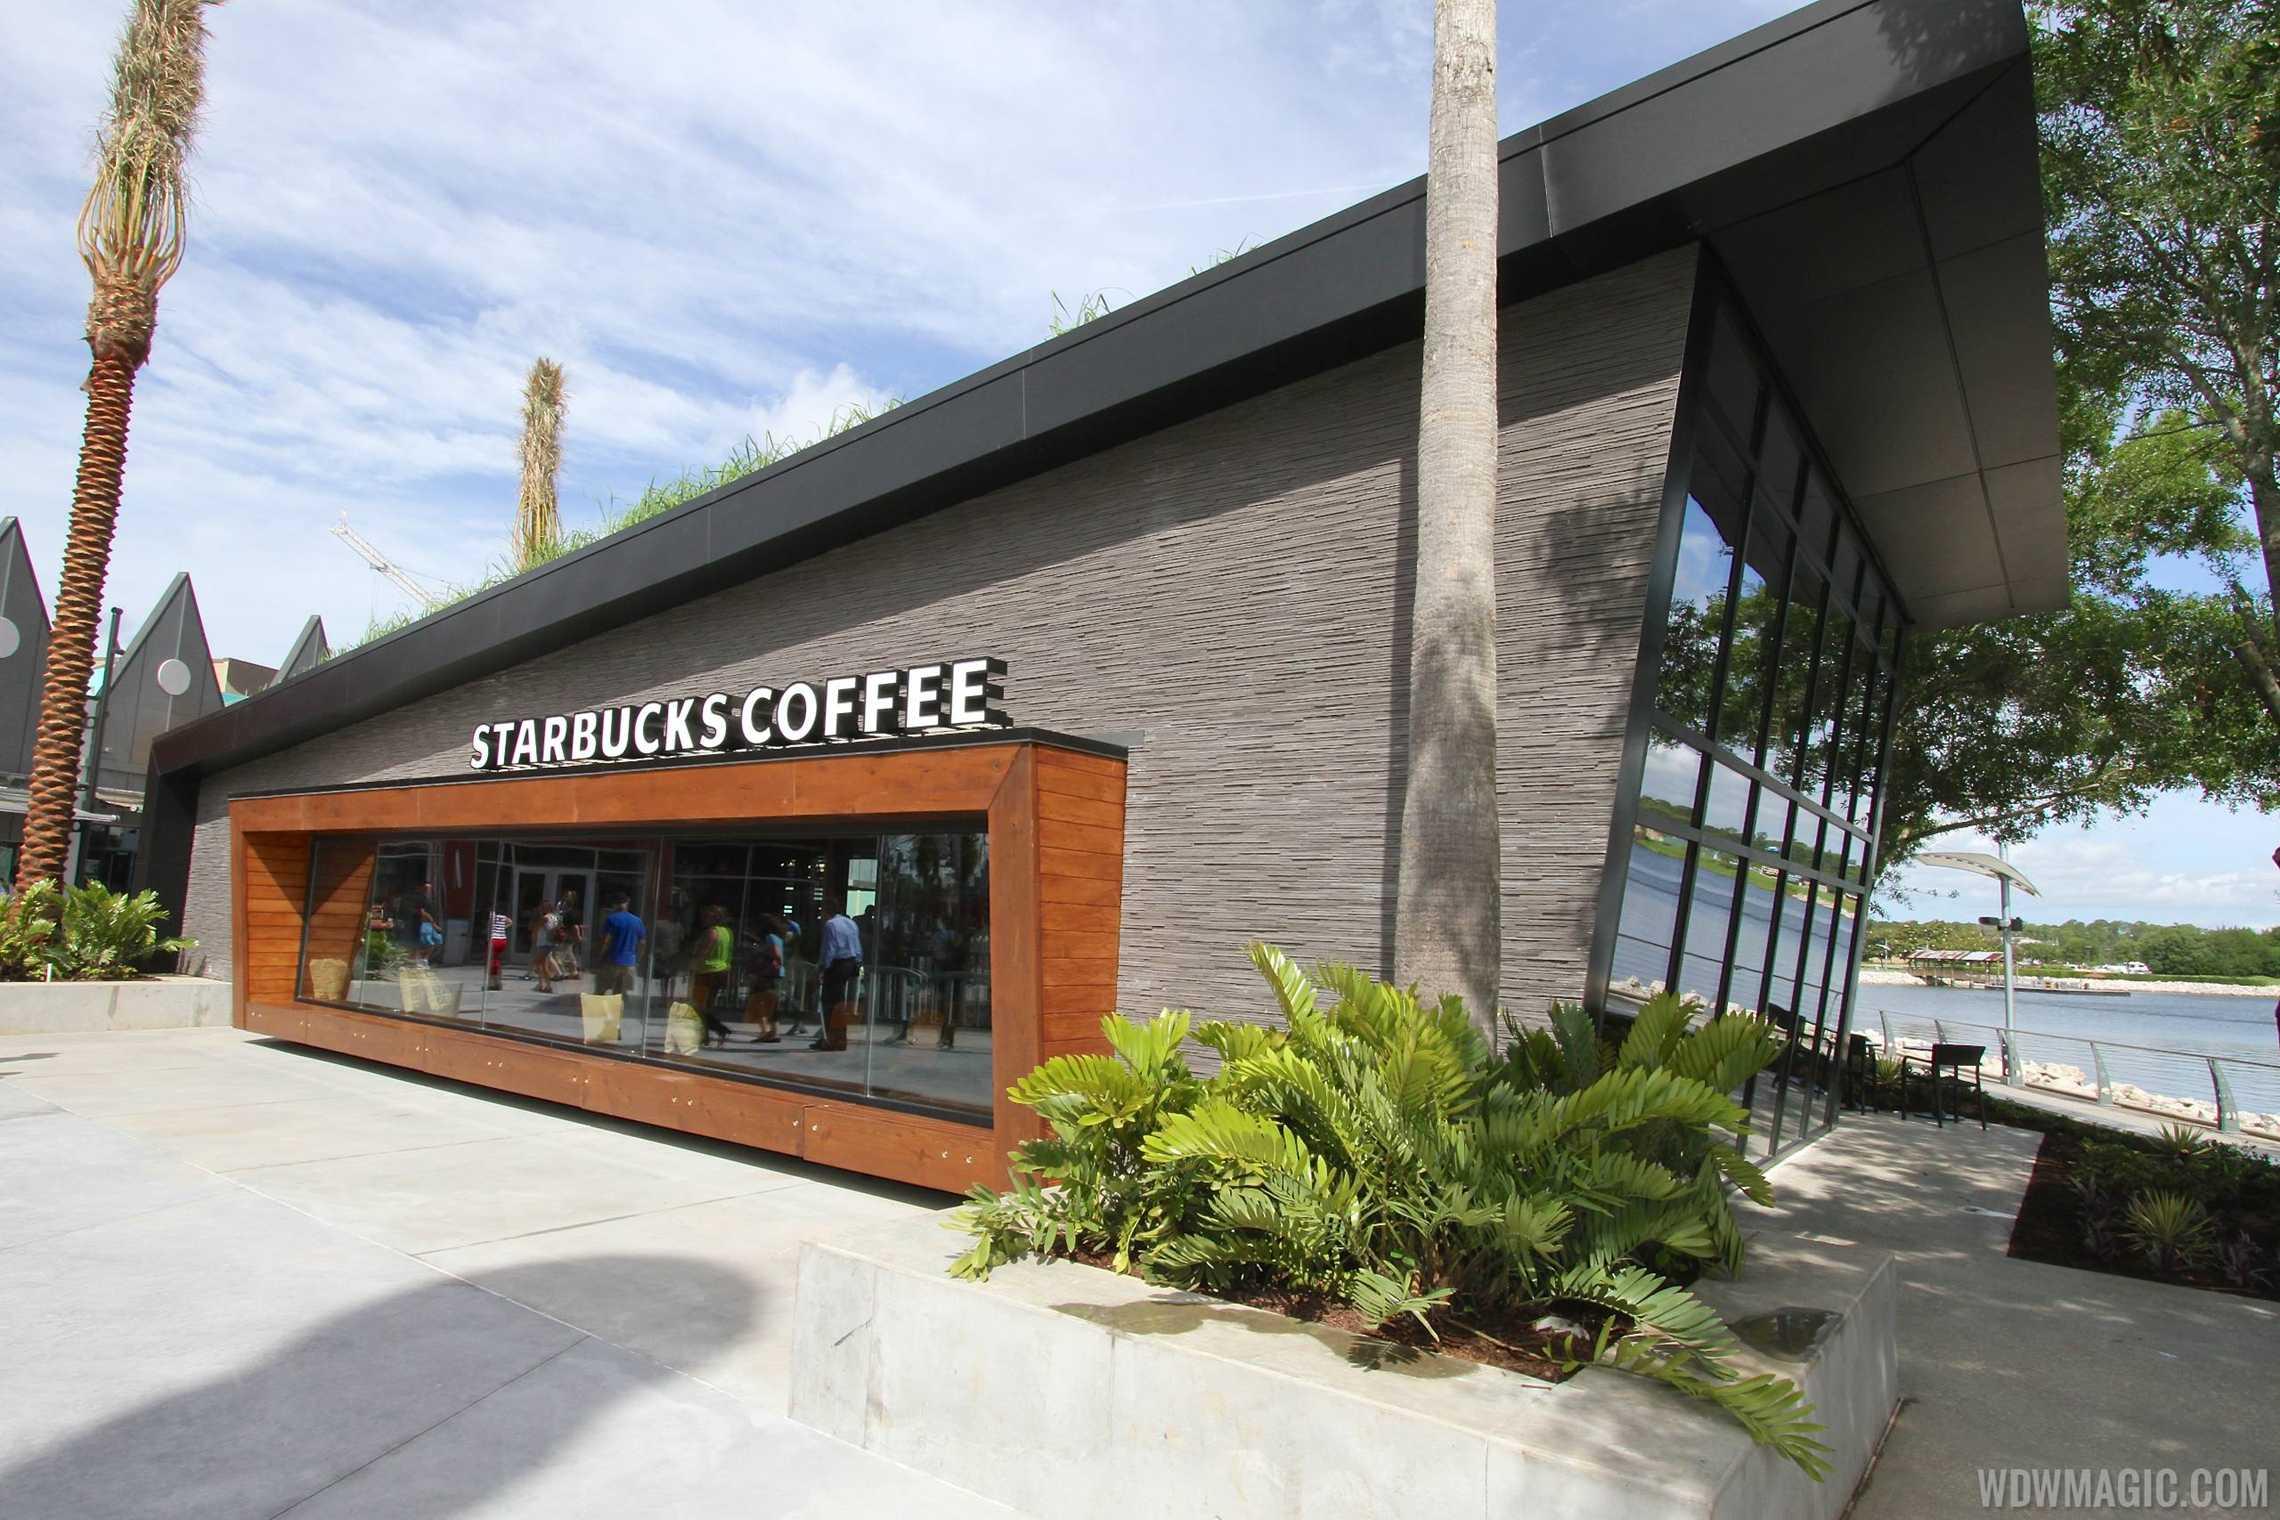 Starbucks West Side exterior